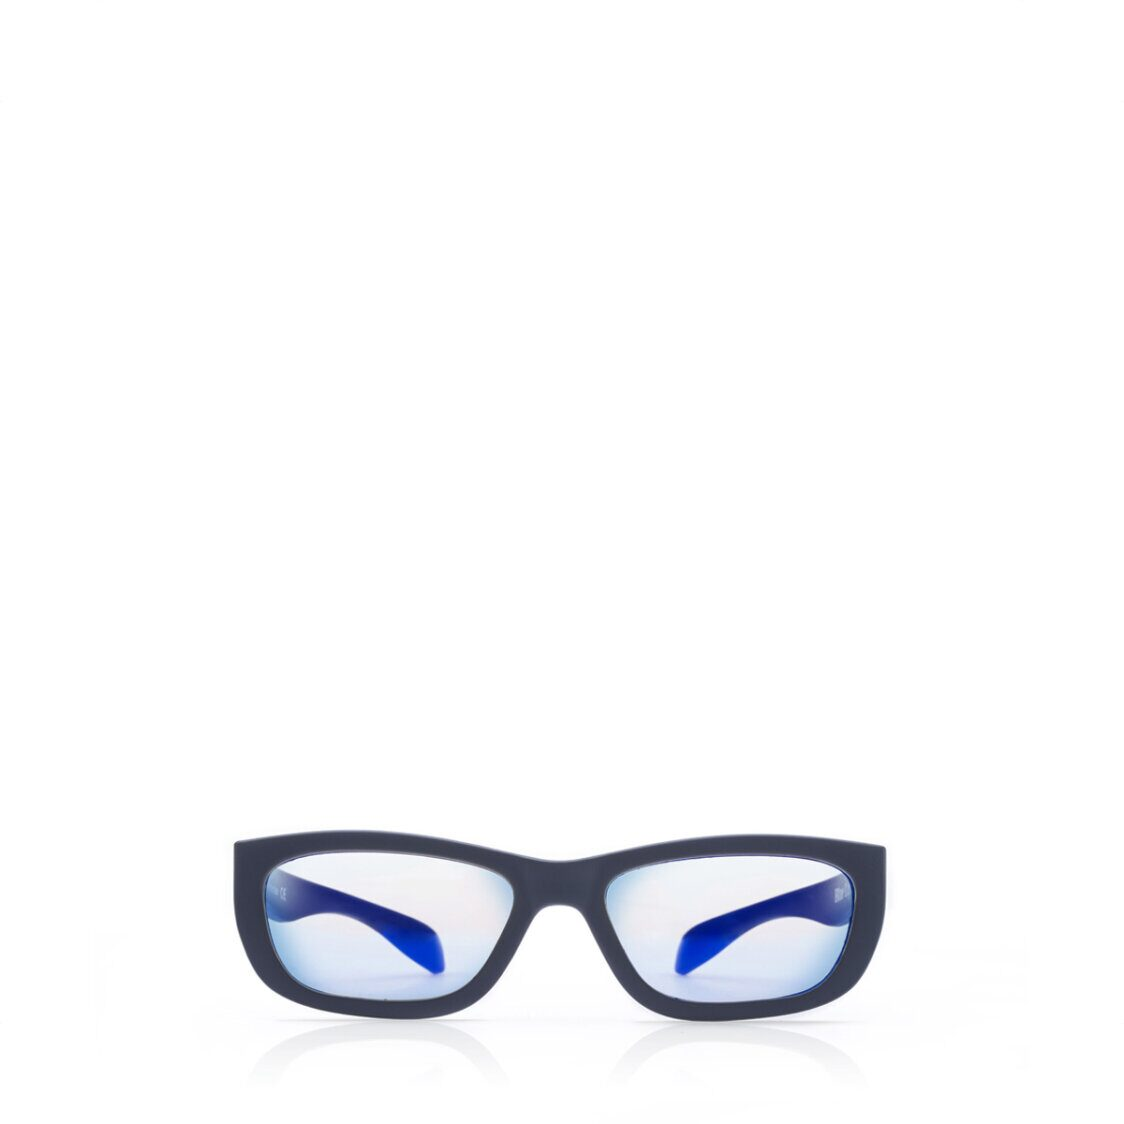 Shadez Eyewear Blue Light Grey Teeny aged 7- 16 years old